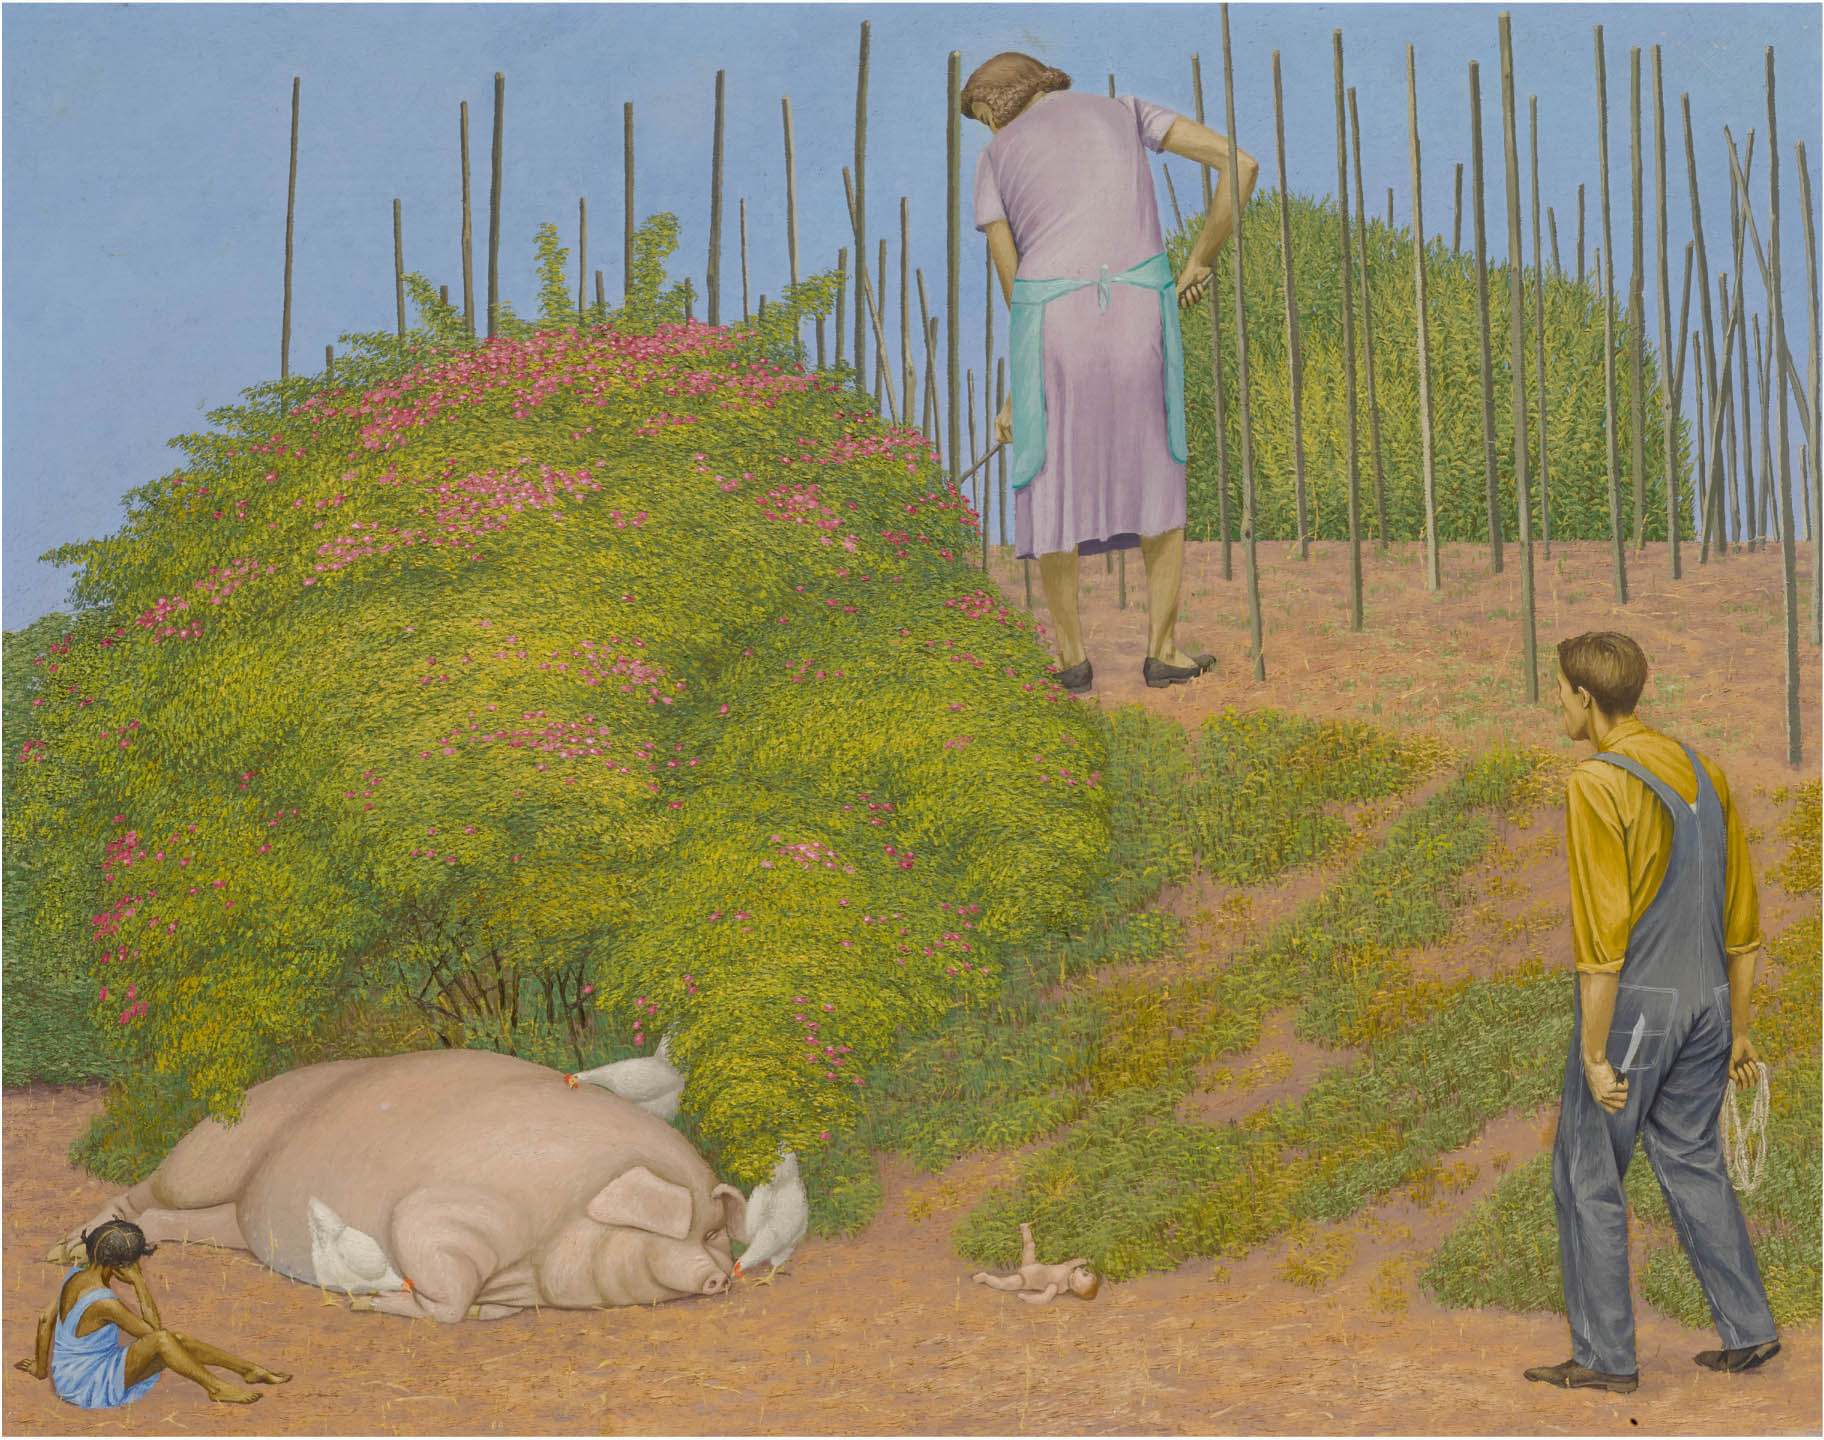 Anatomia di un'opera d'arte: The Rosebush di Henry Koerner